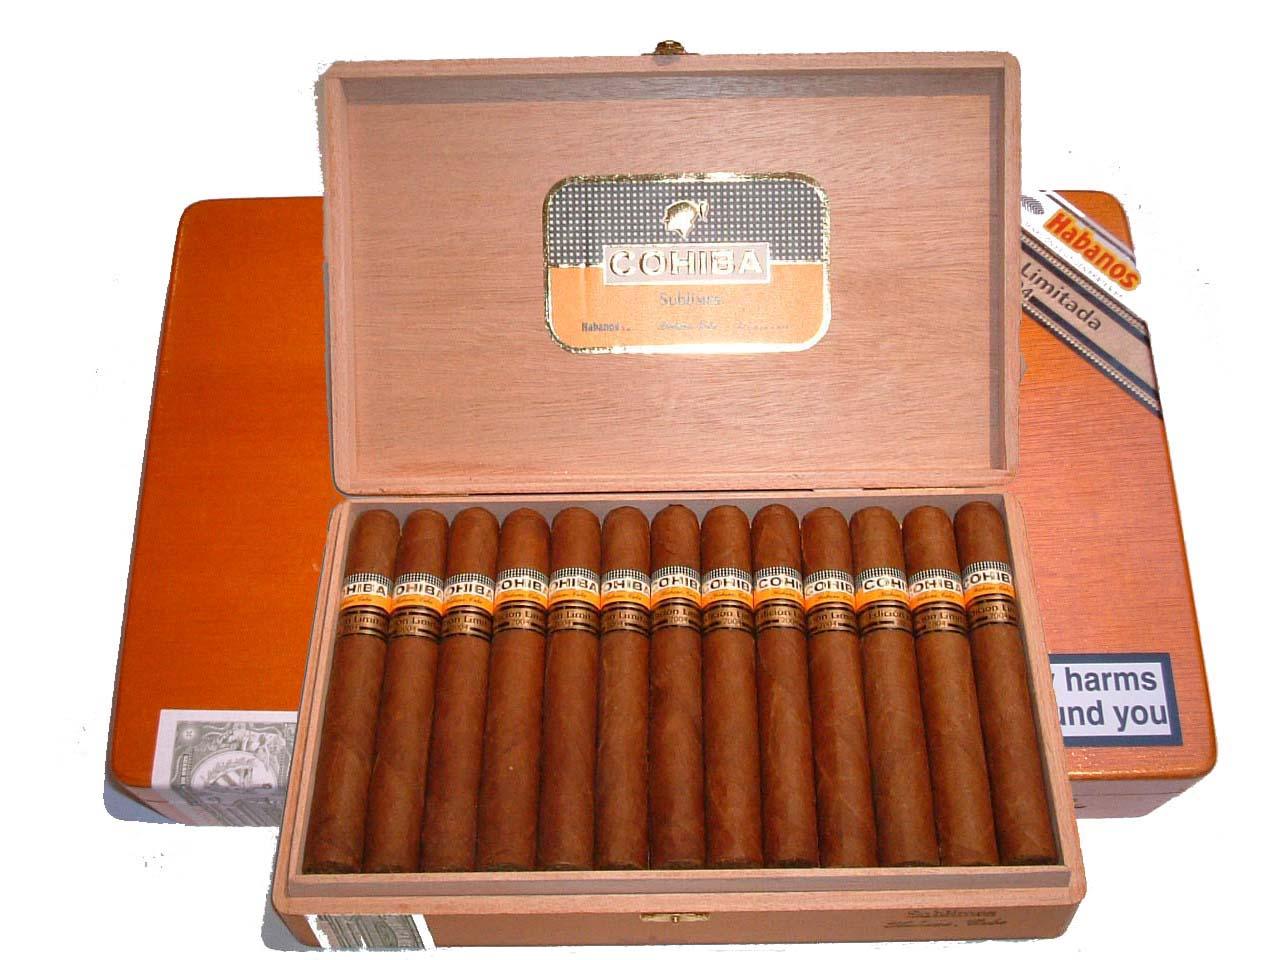 cohiba_habanos_cigar_szivarvilag_cohiba_szivar_2.jpg